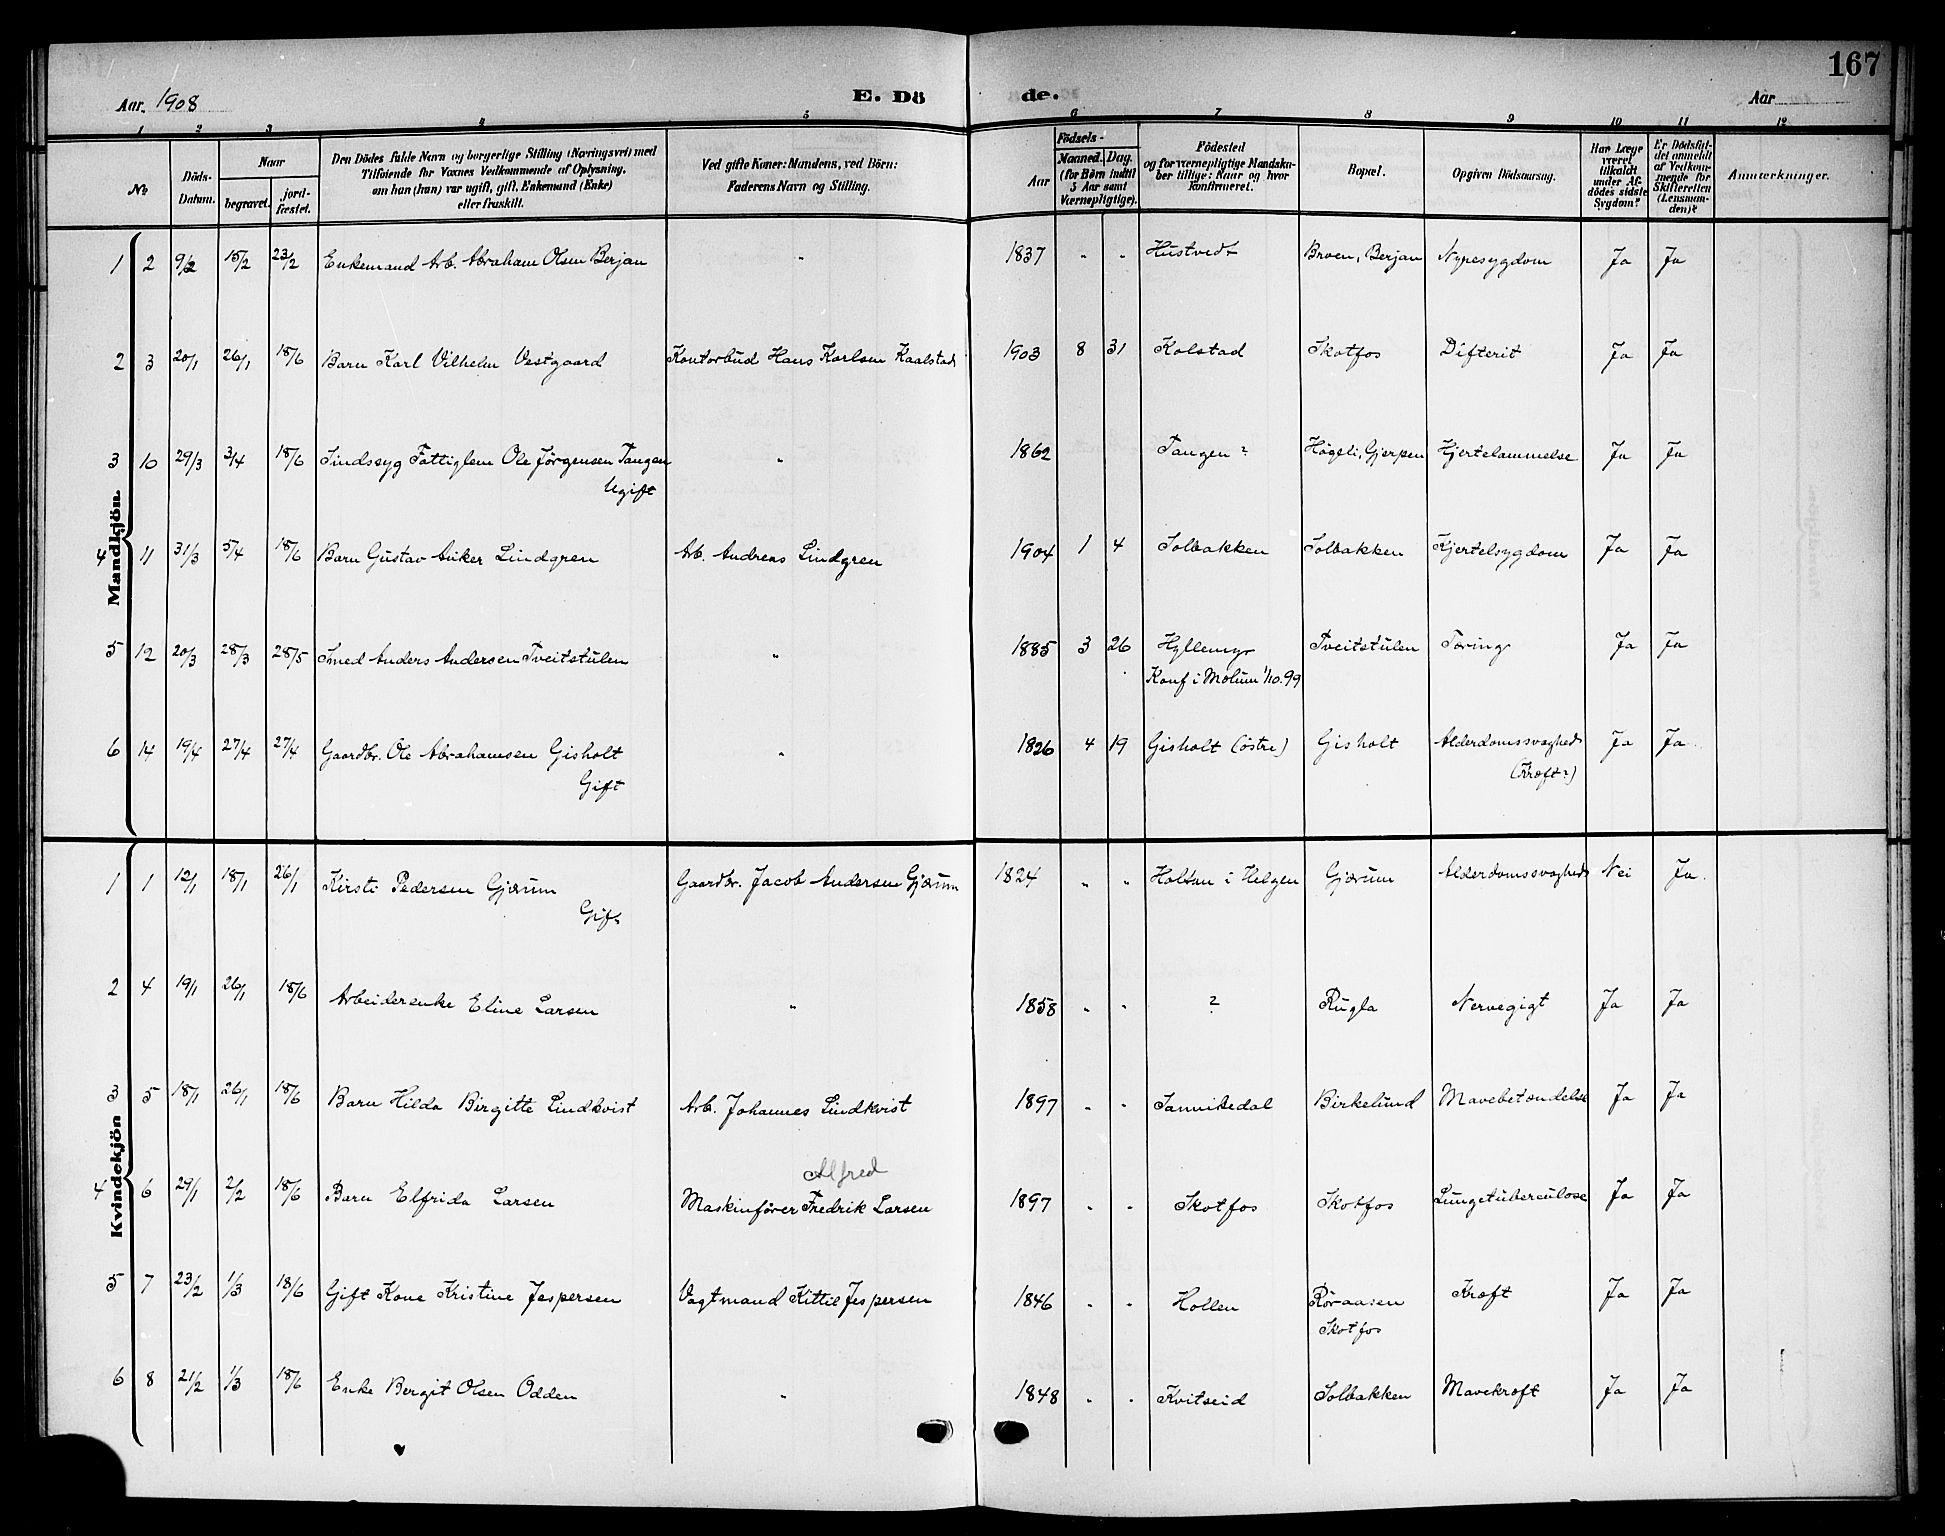 SAKO, Solum kirkebøker, G/Gb/L0005: Klokkerbok nr. II 5, 1905-1914, s. 167